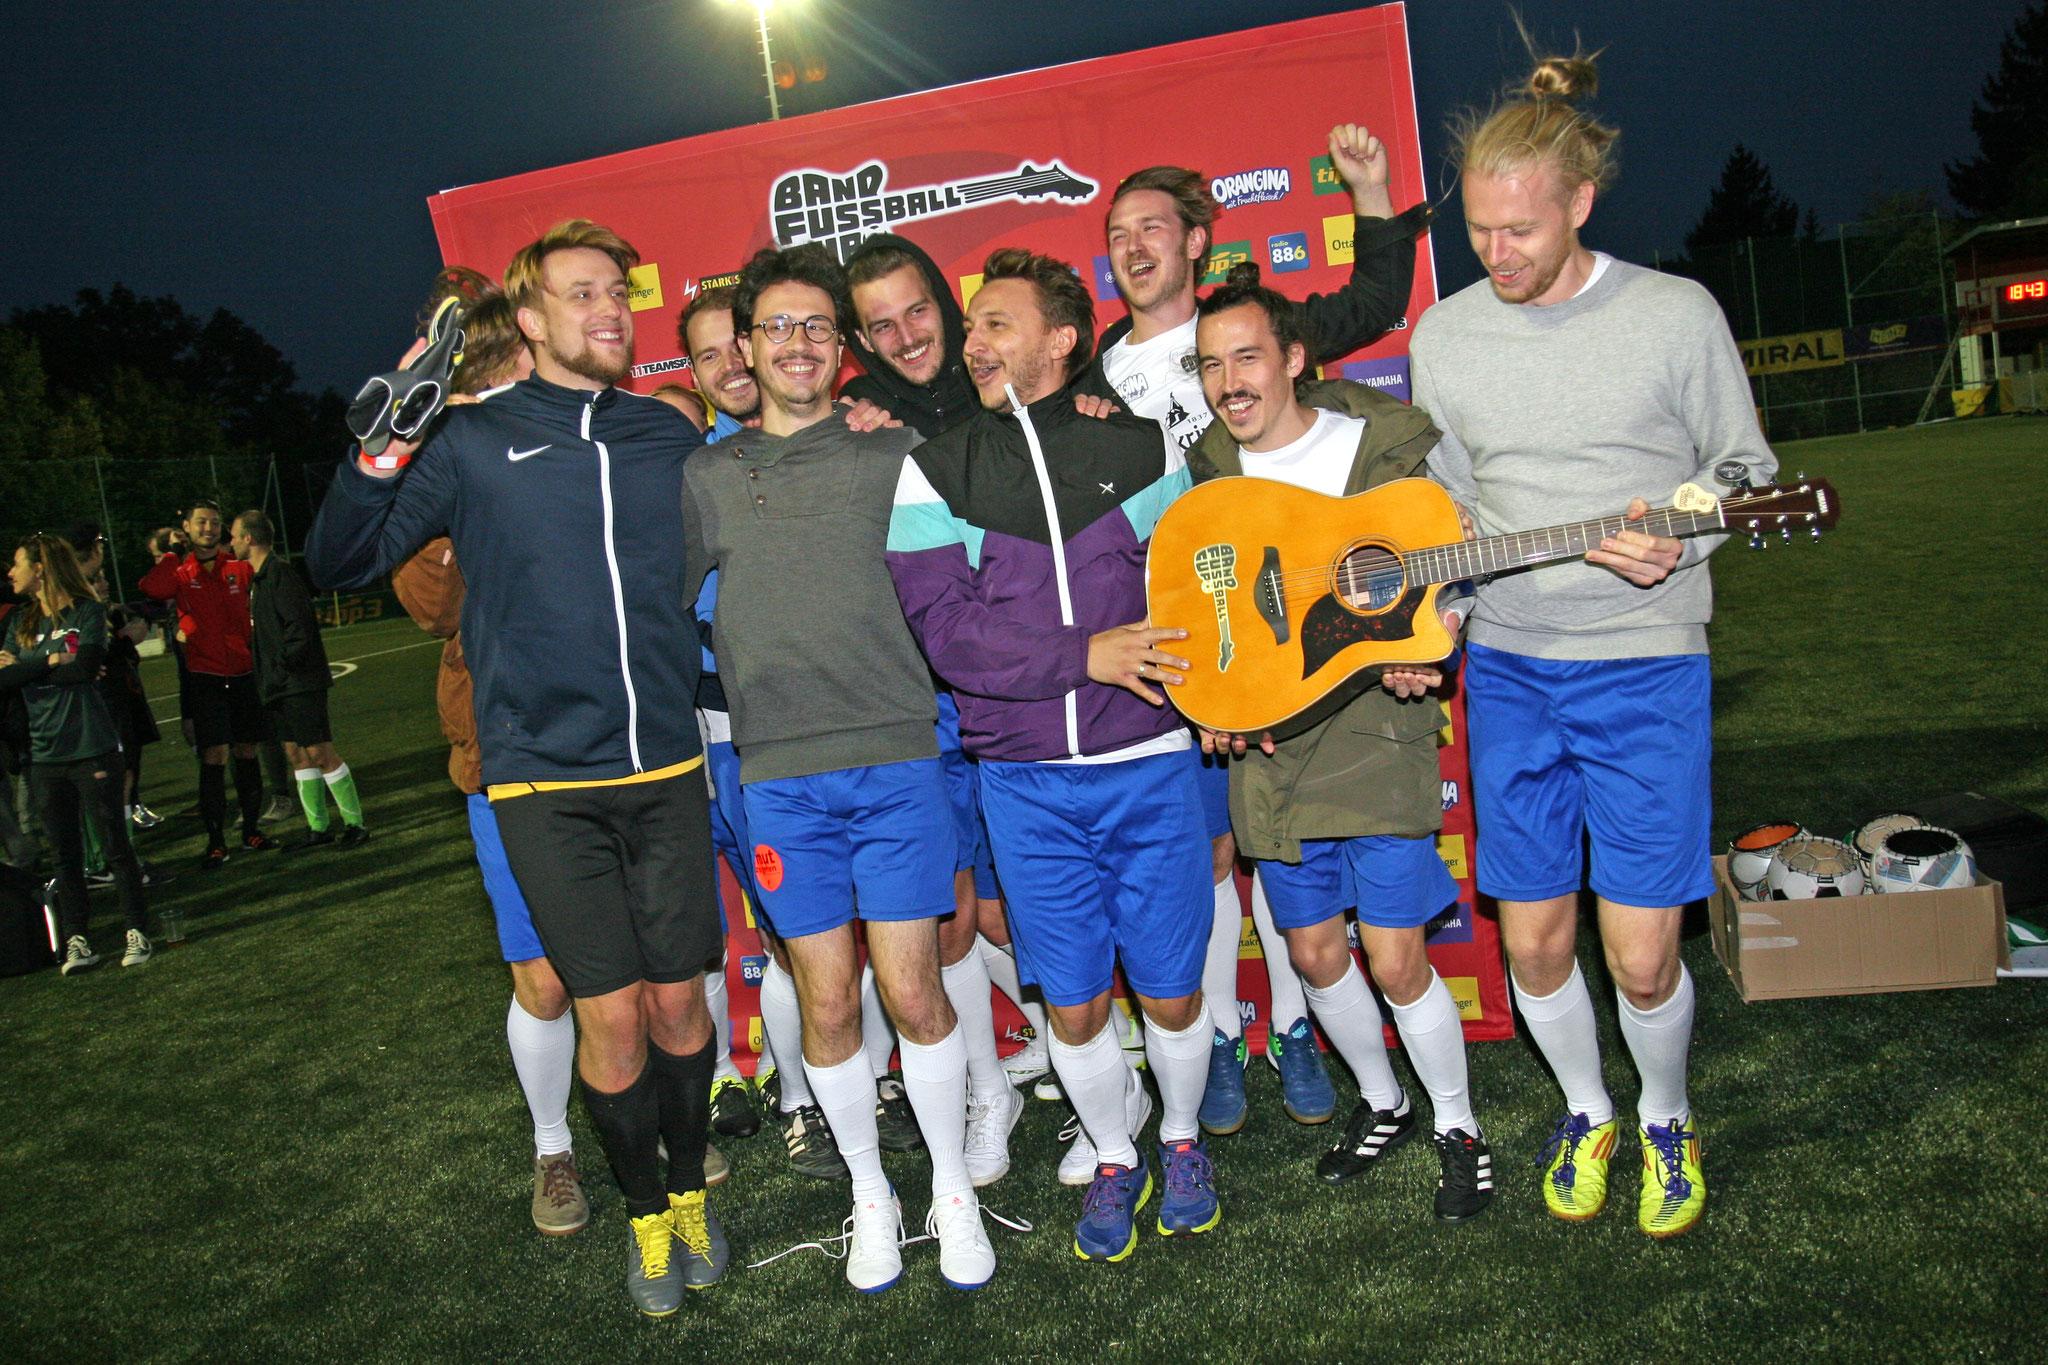 Folkshilfe gewinnen Band Fussball Cup, 06.10.2019 (c) miggl.at